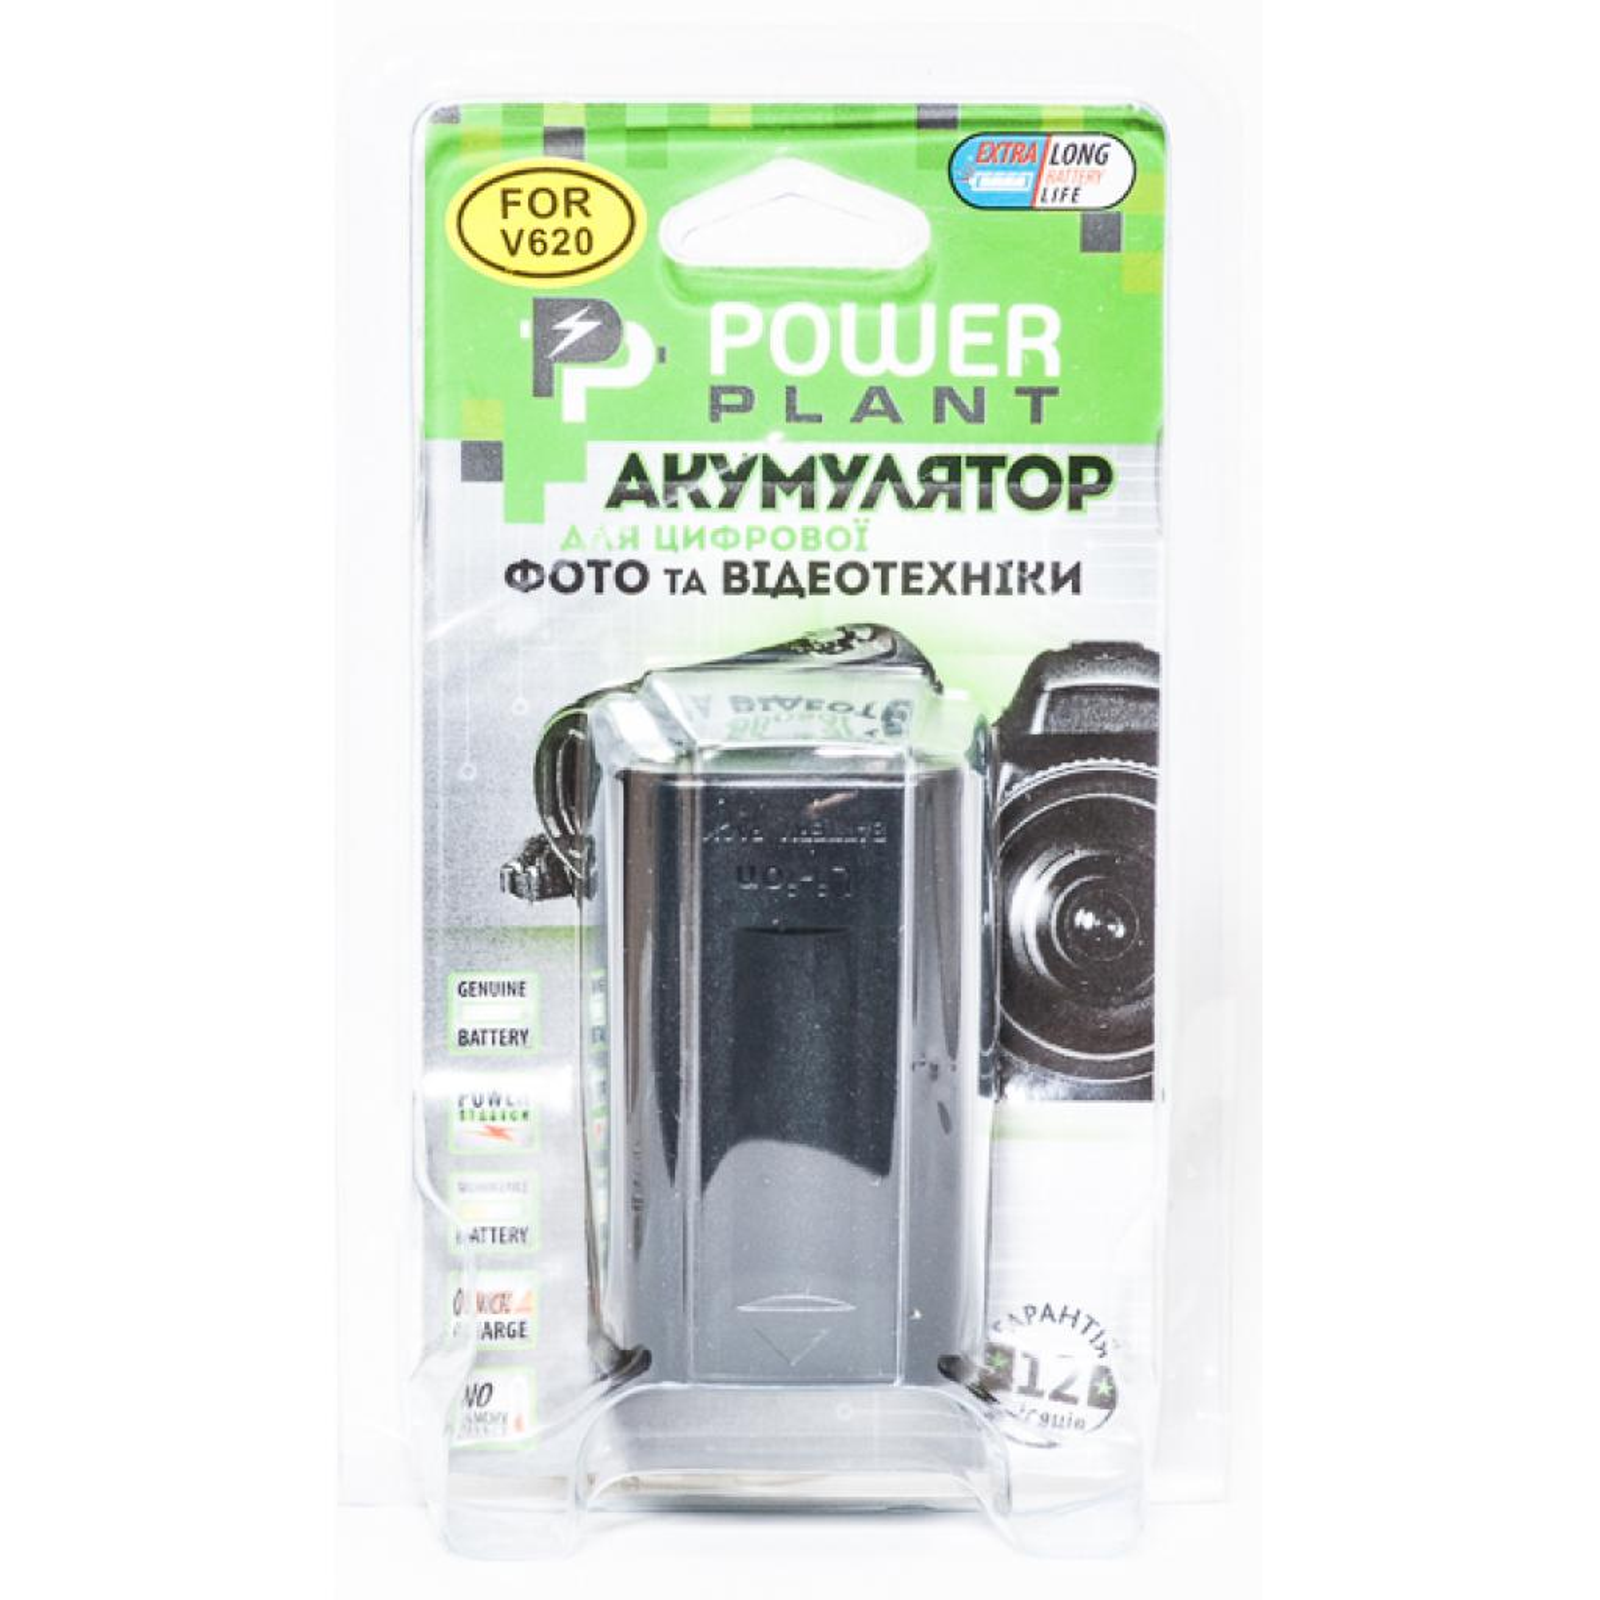 Аккумулятор к фото/видео PowerPlant Panasonic CGR-V620, CGR-V26S (DV00DV1337) изображение 3